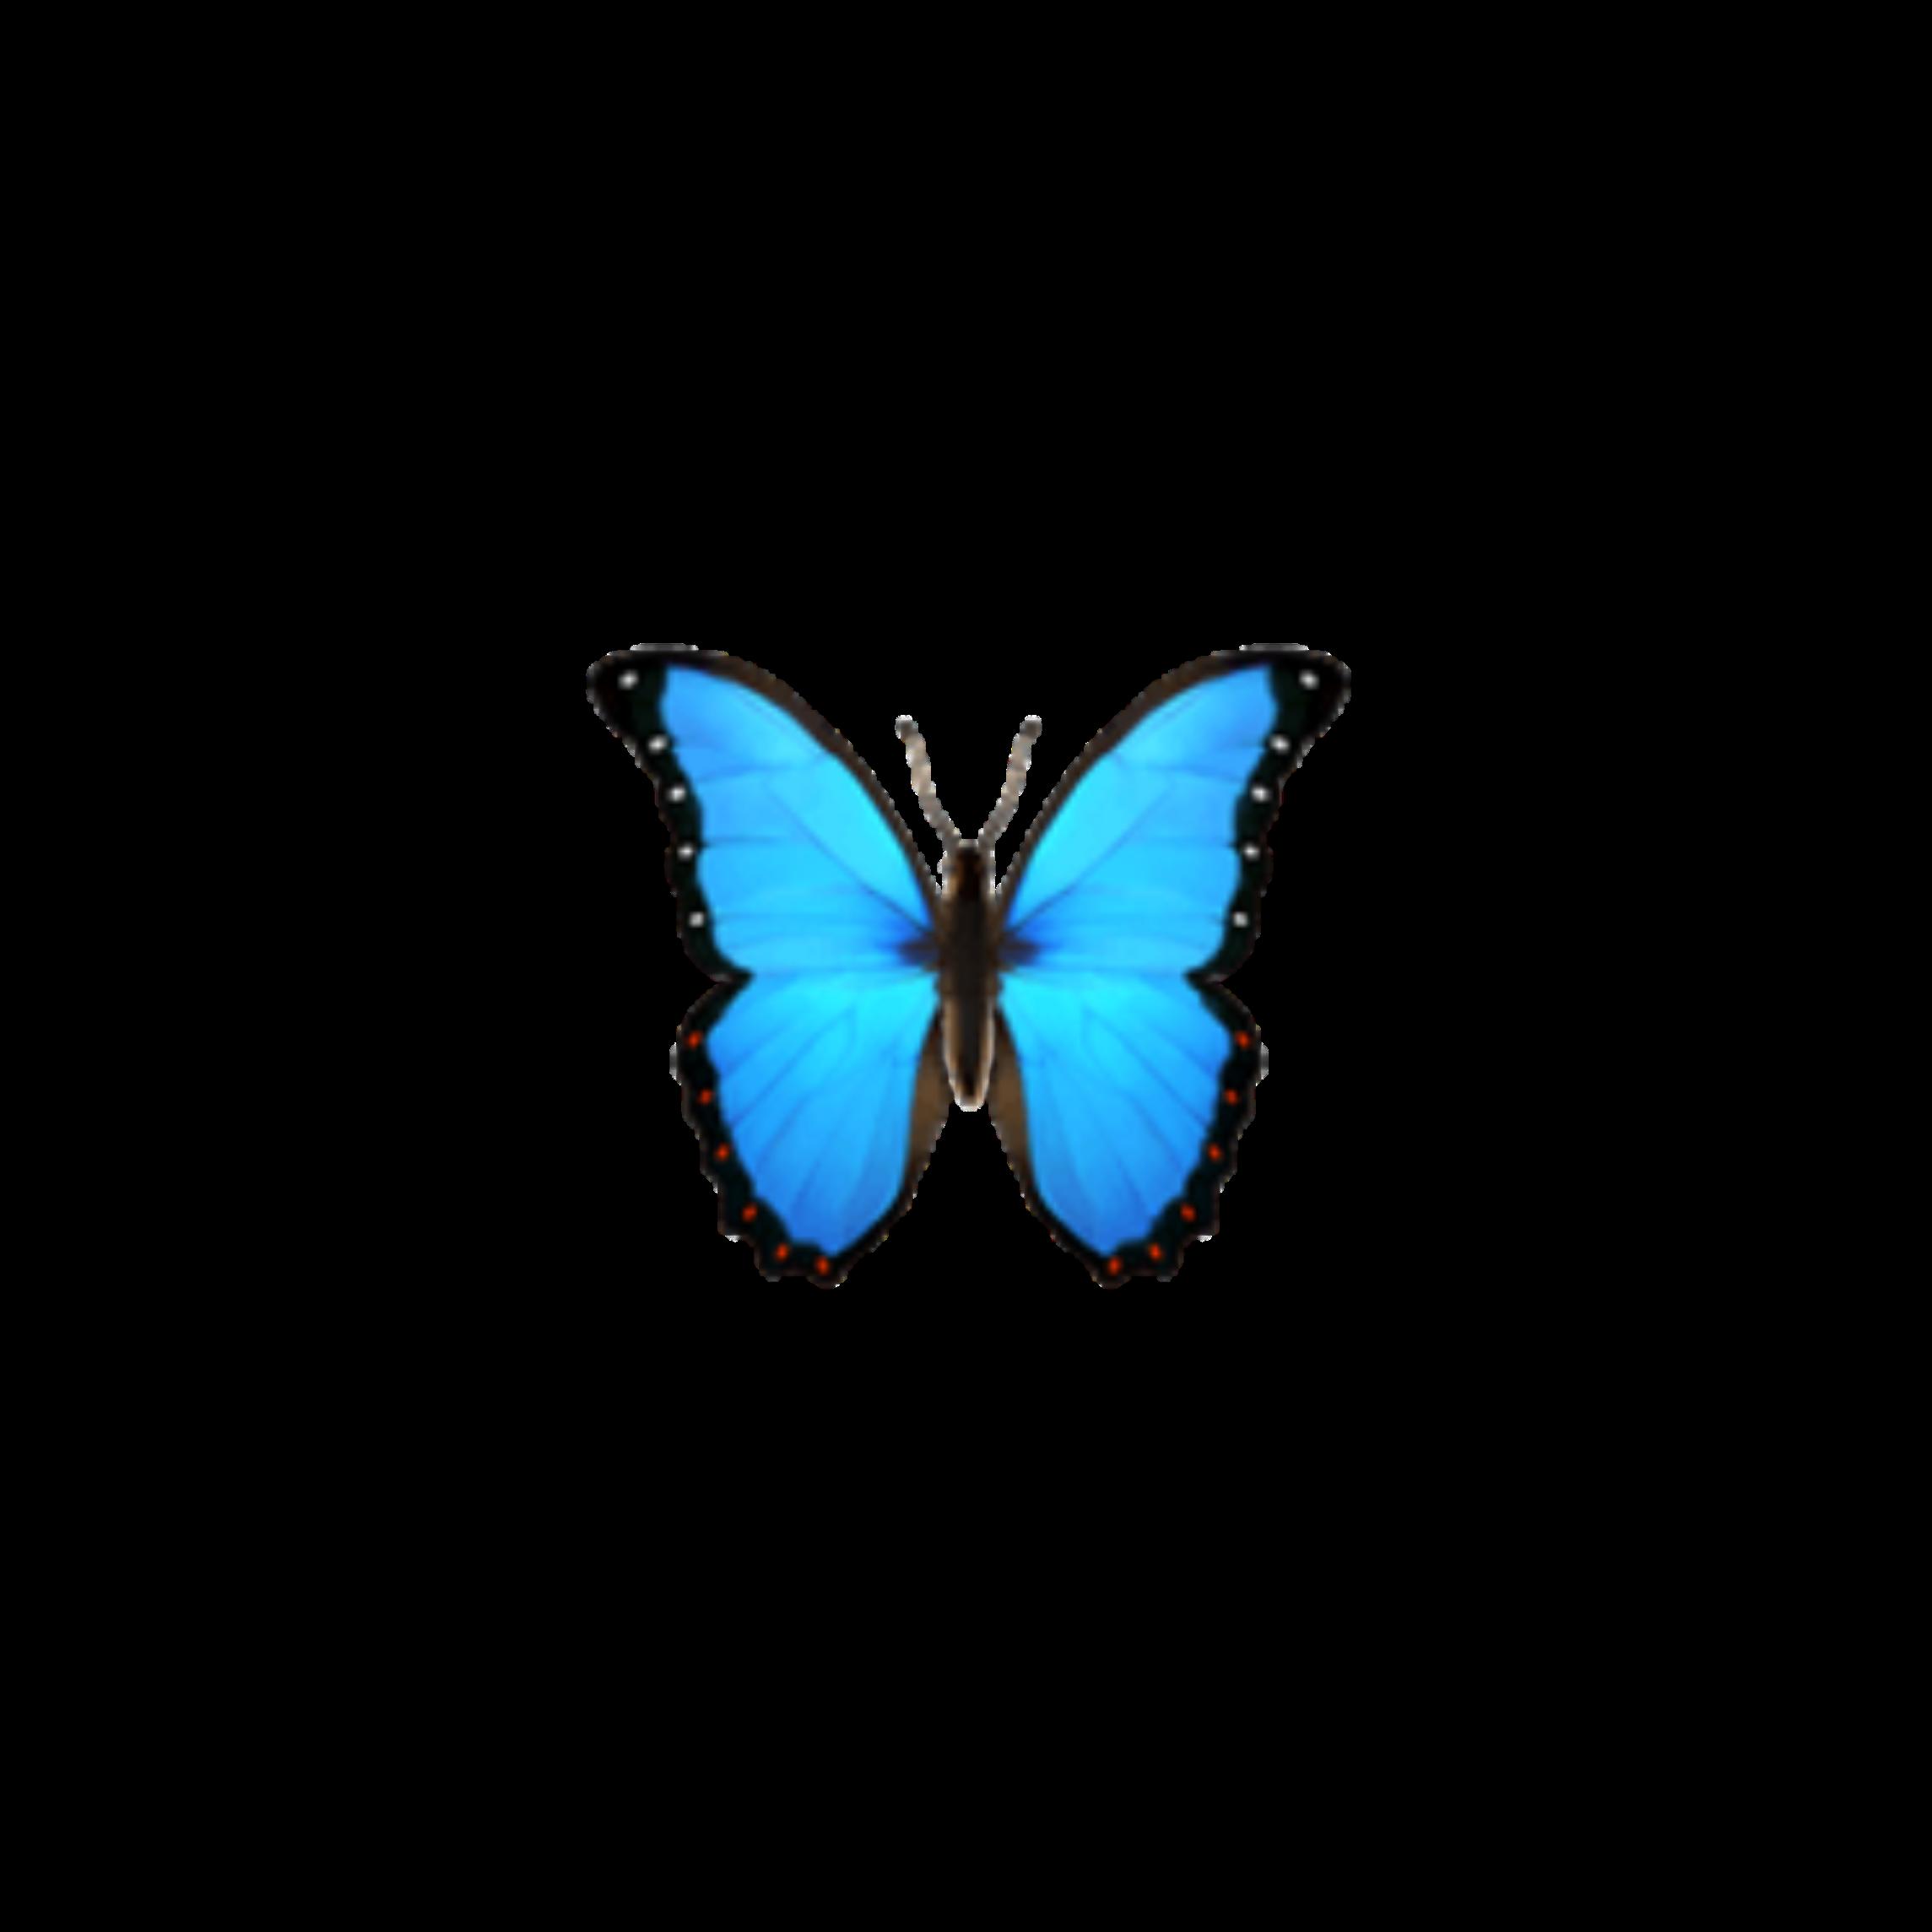 butterfly emoji blue butterflys iphone imoji applemoji...